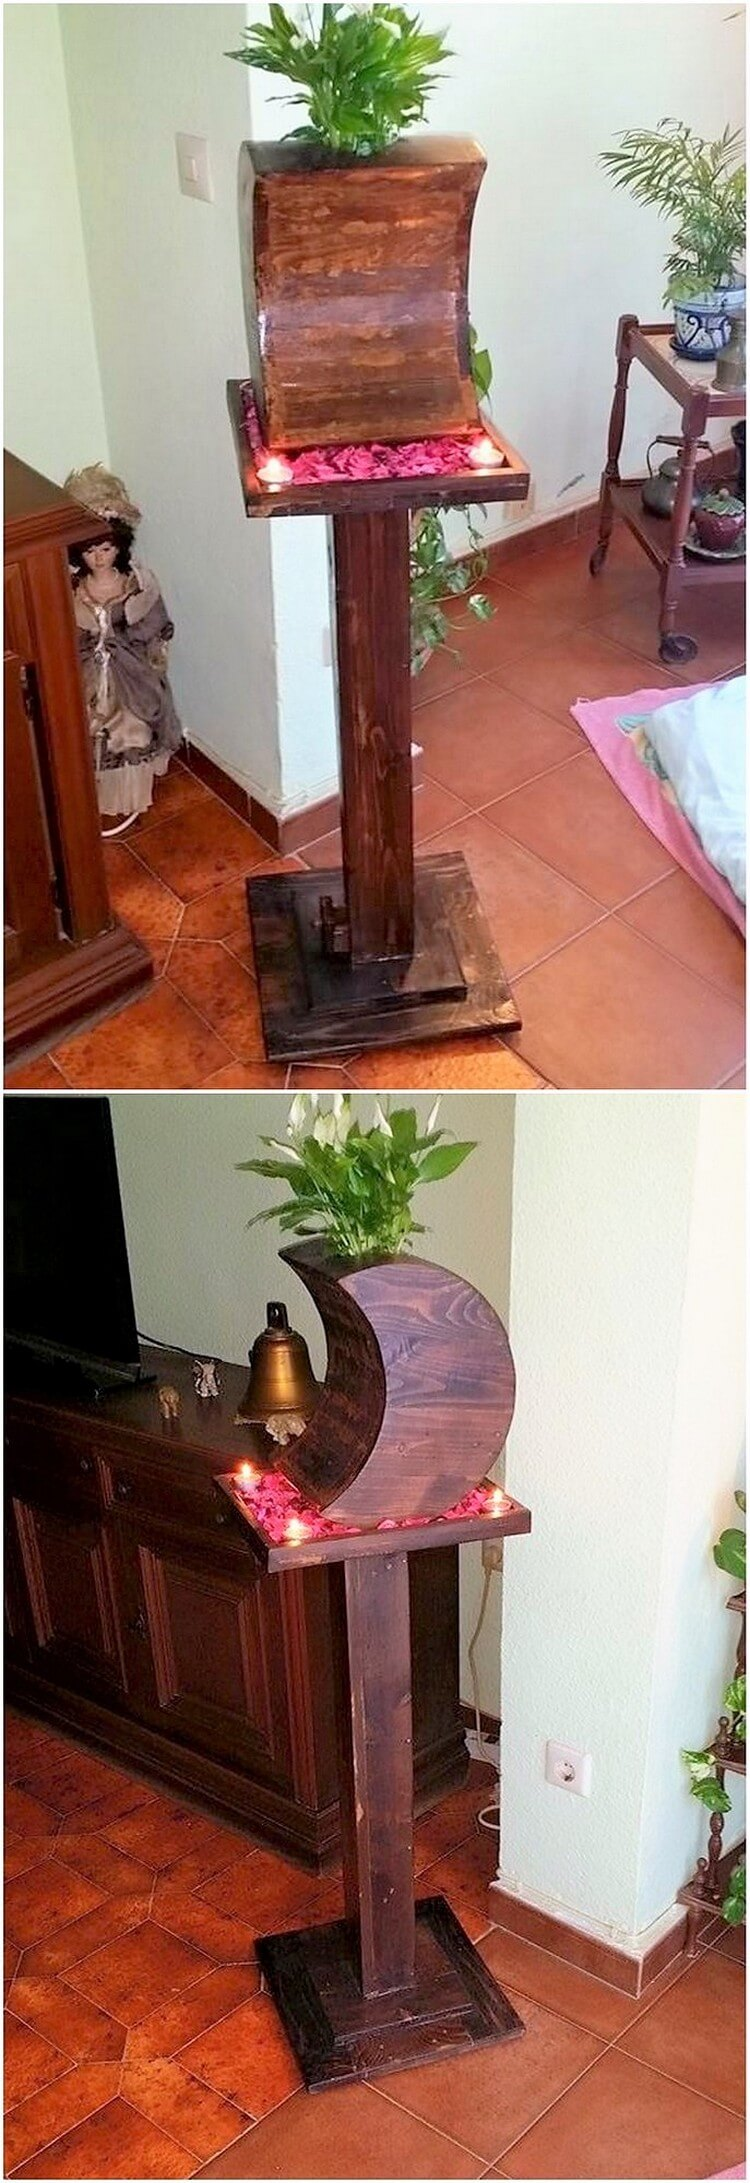 Pallet Decorative Creation